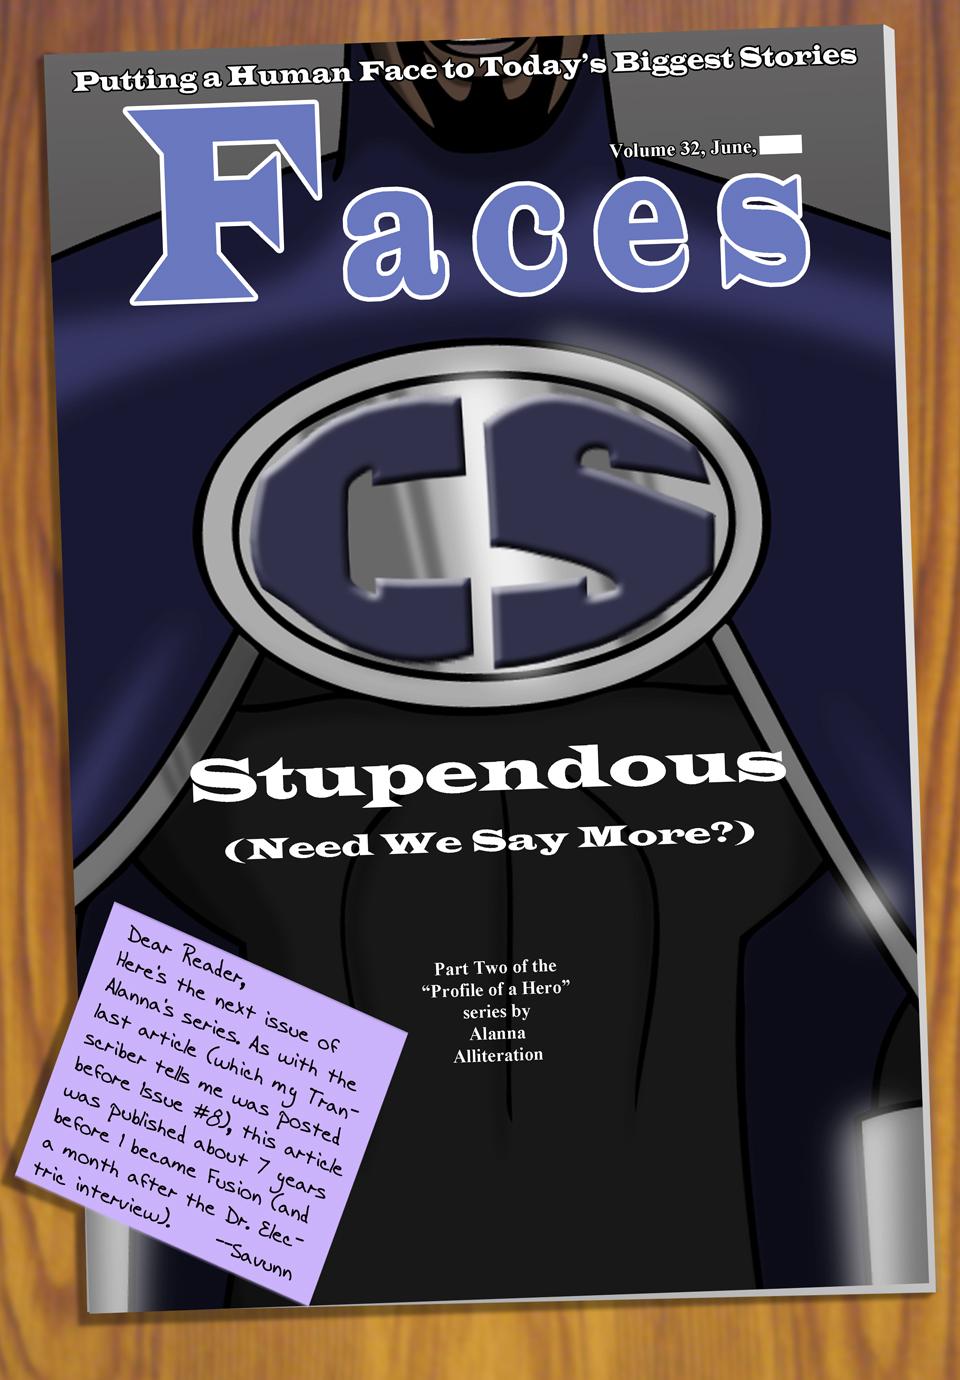 Interleude--Faces Magazine Interview 2 Cover